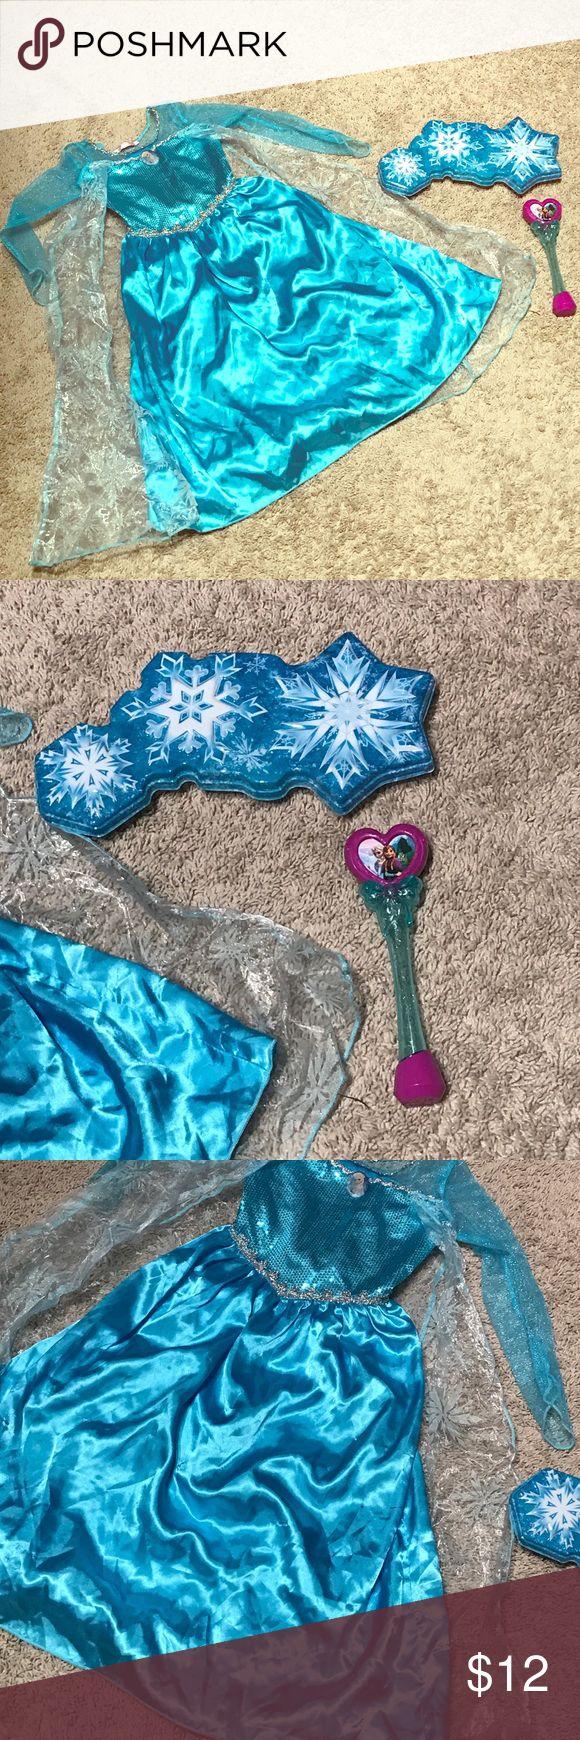 Frozen Elsa Dress Up Costume plus Accessories Frozen Elsa Dress Up Costume plus Accessories. Size 4/5 Costumes